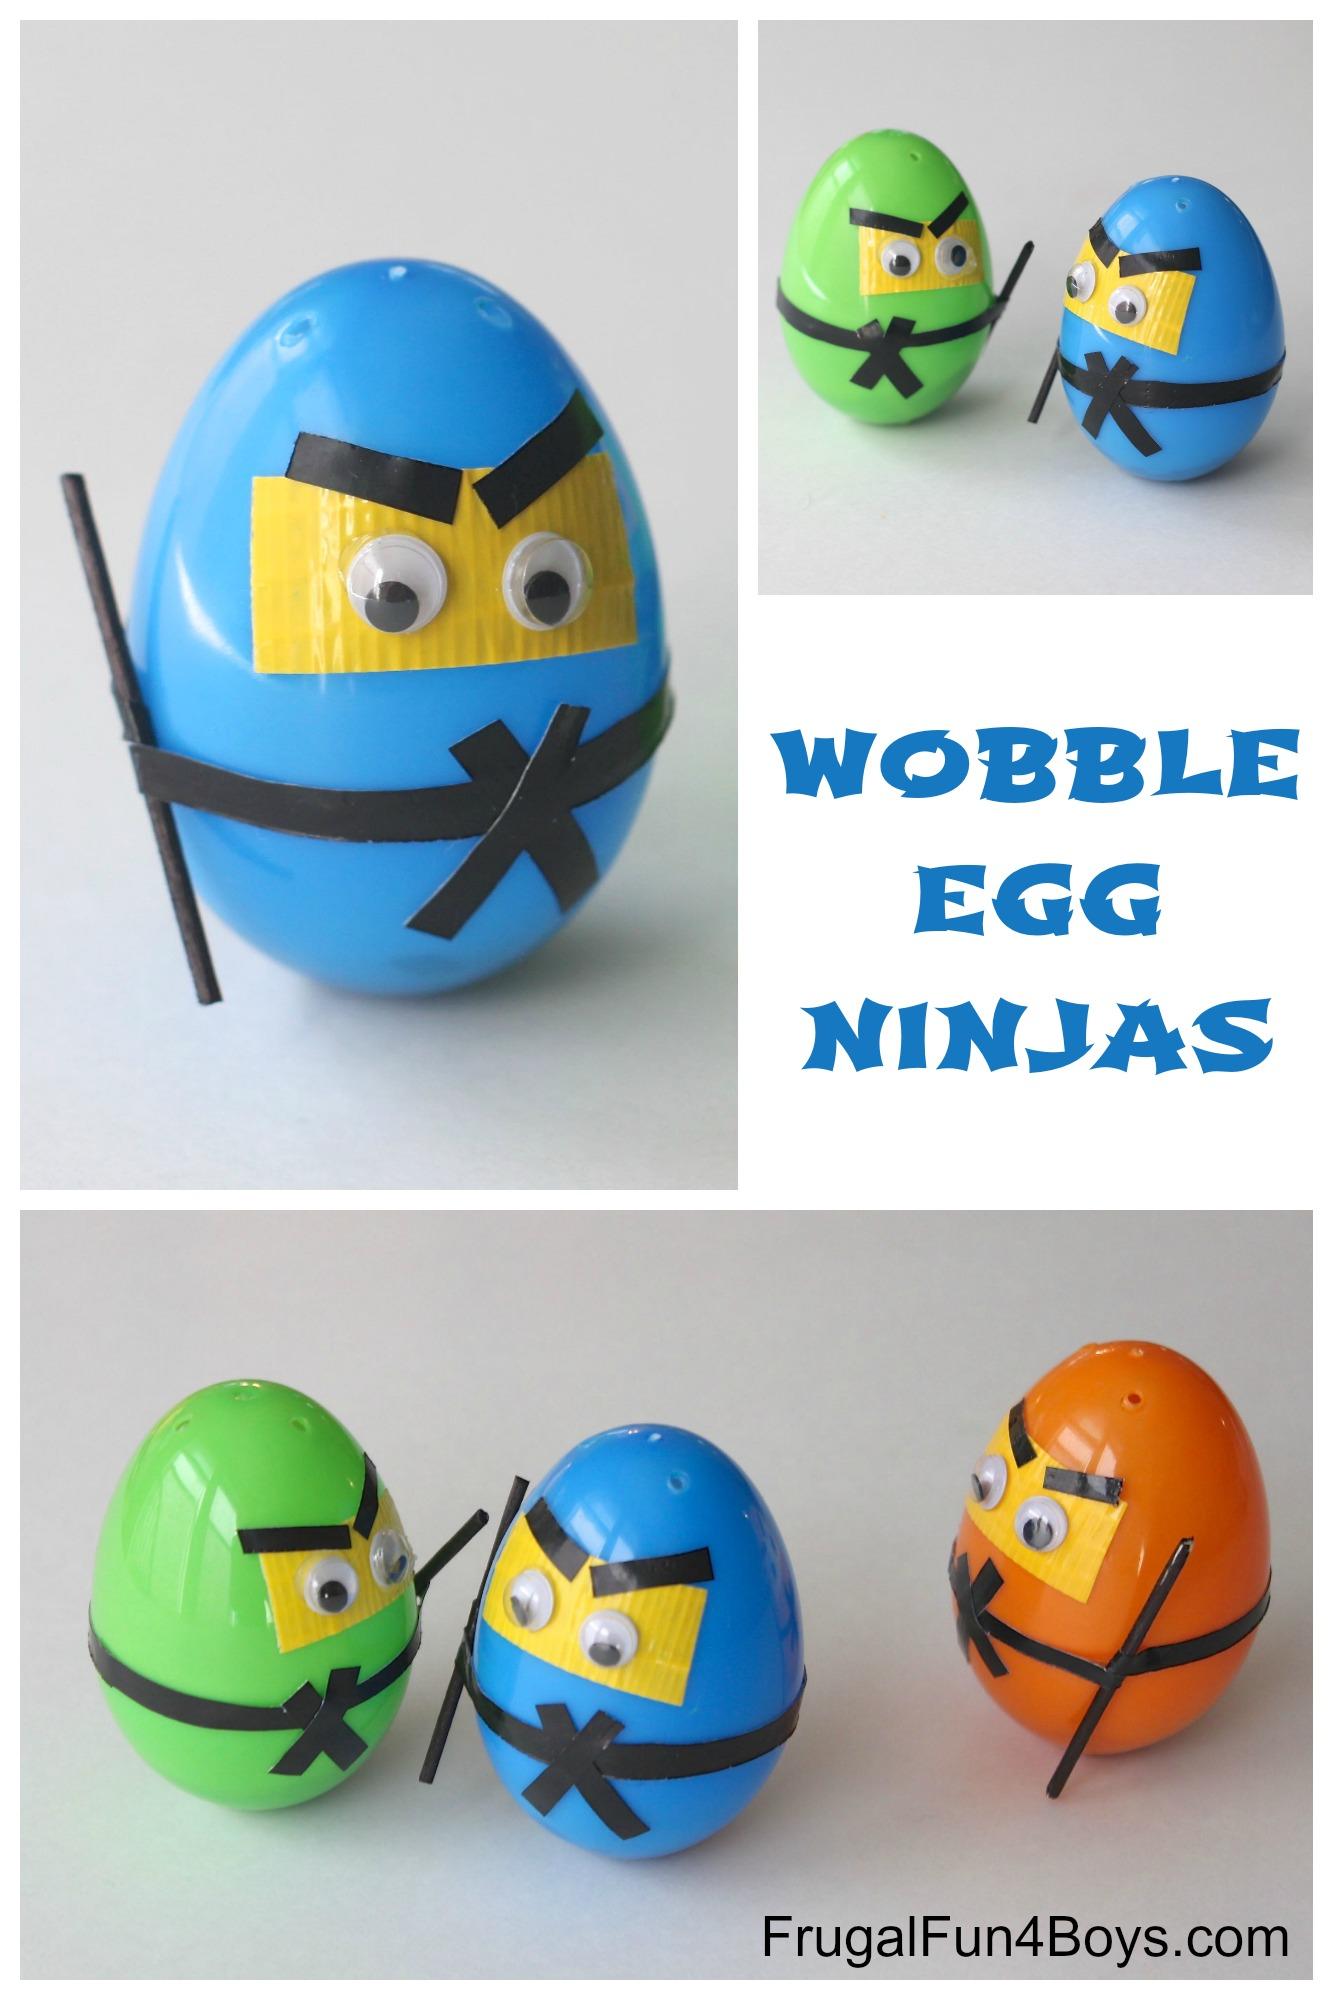 How to Make Wobble Egg Ninjas